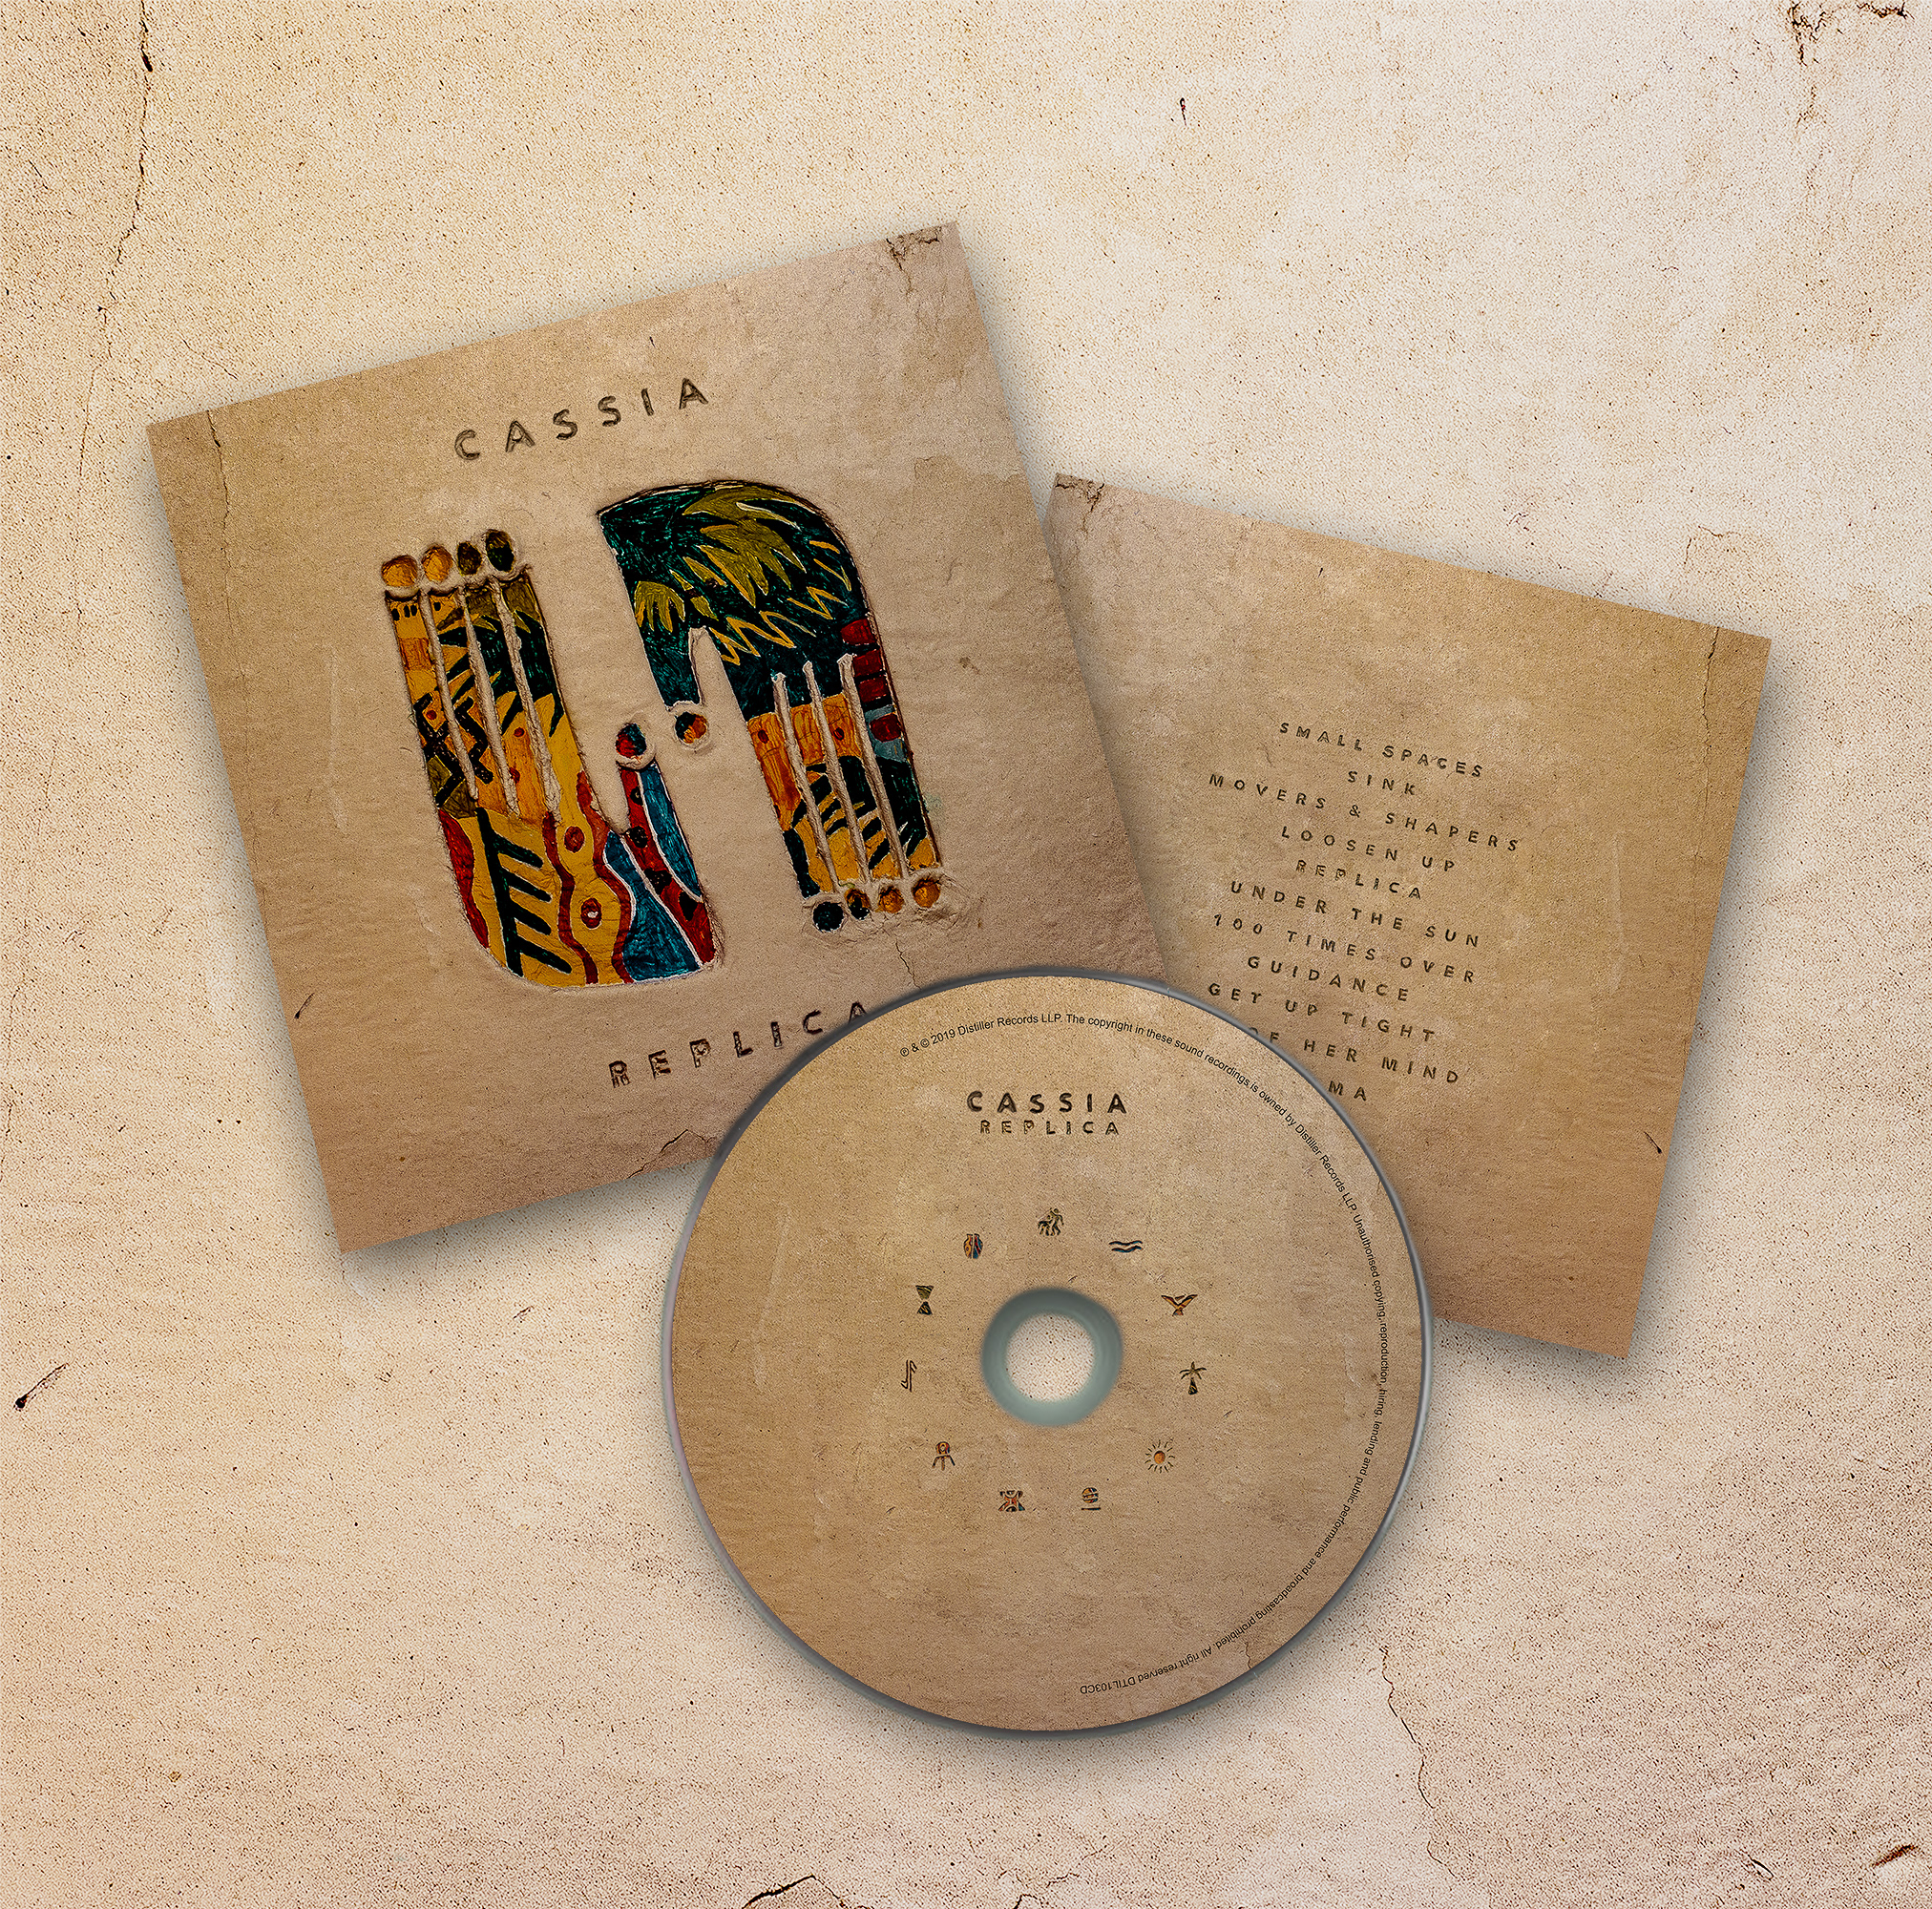 Replica - CD - Cassia